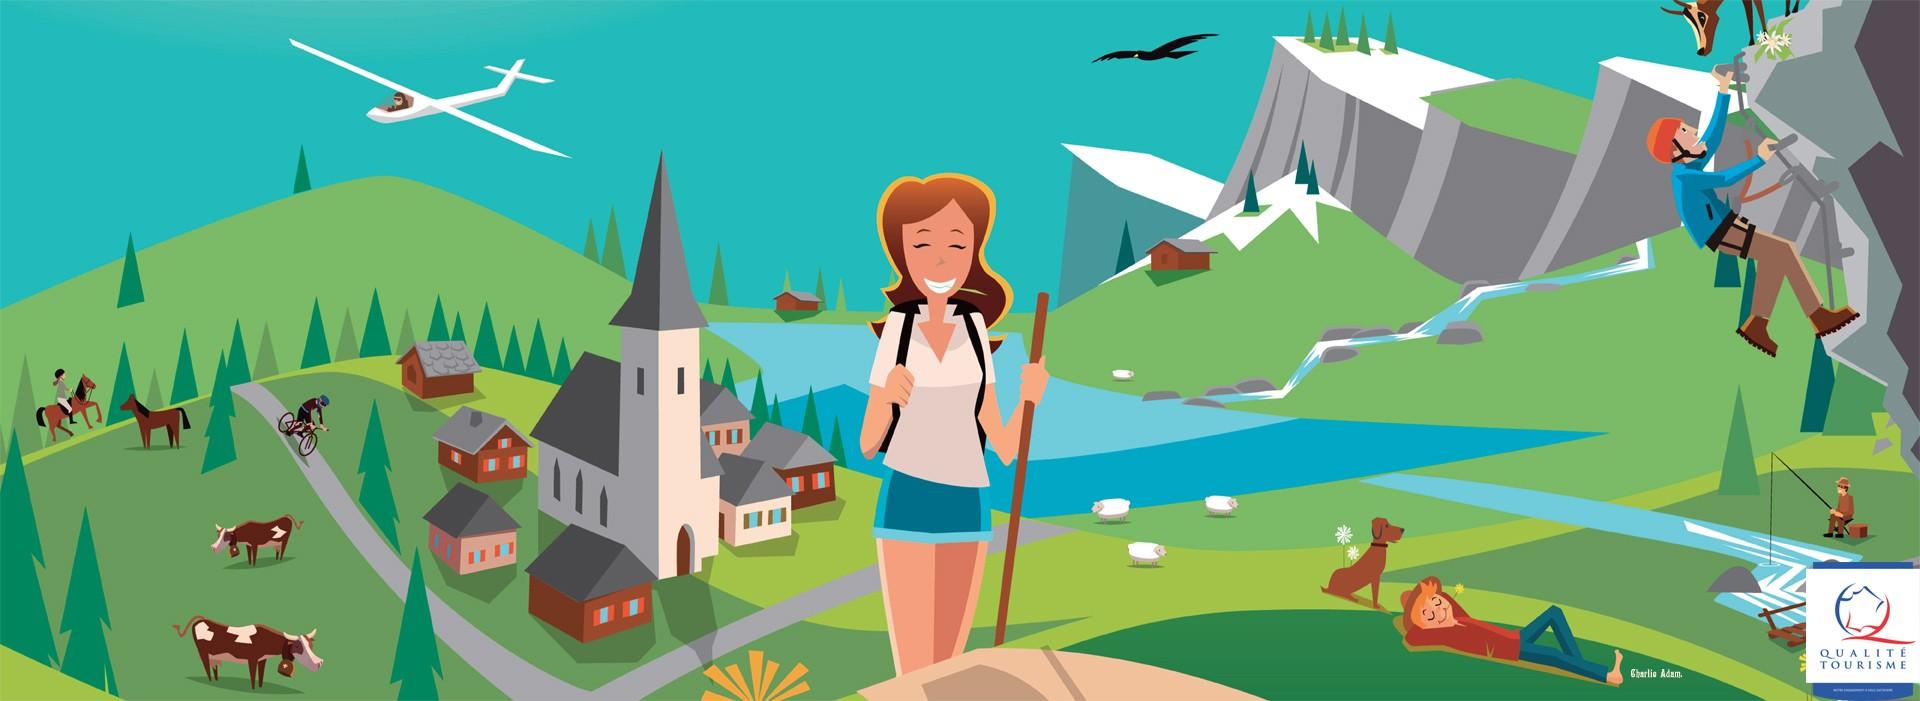 lesalpesduleman-nature-tourisme haute-savoie